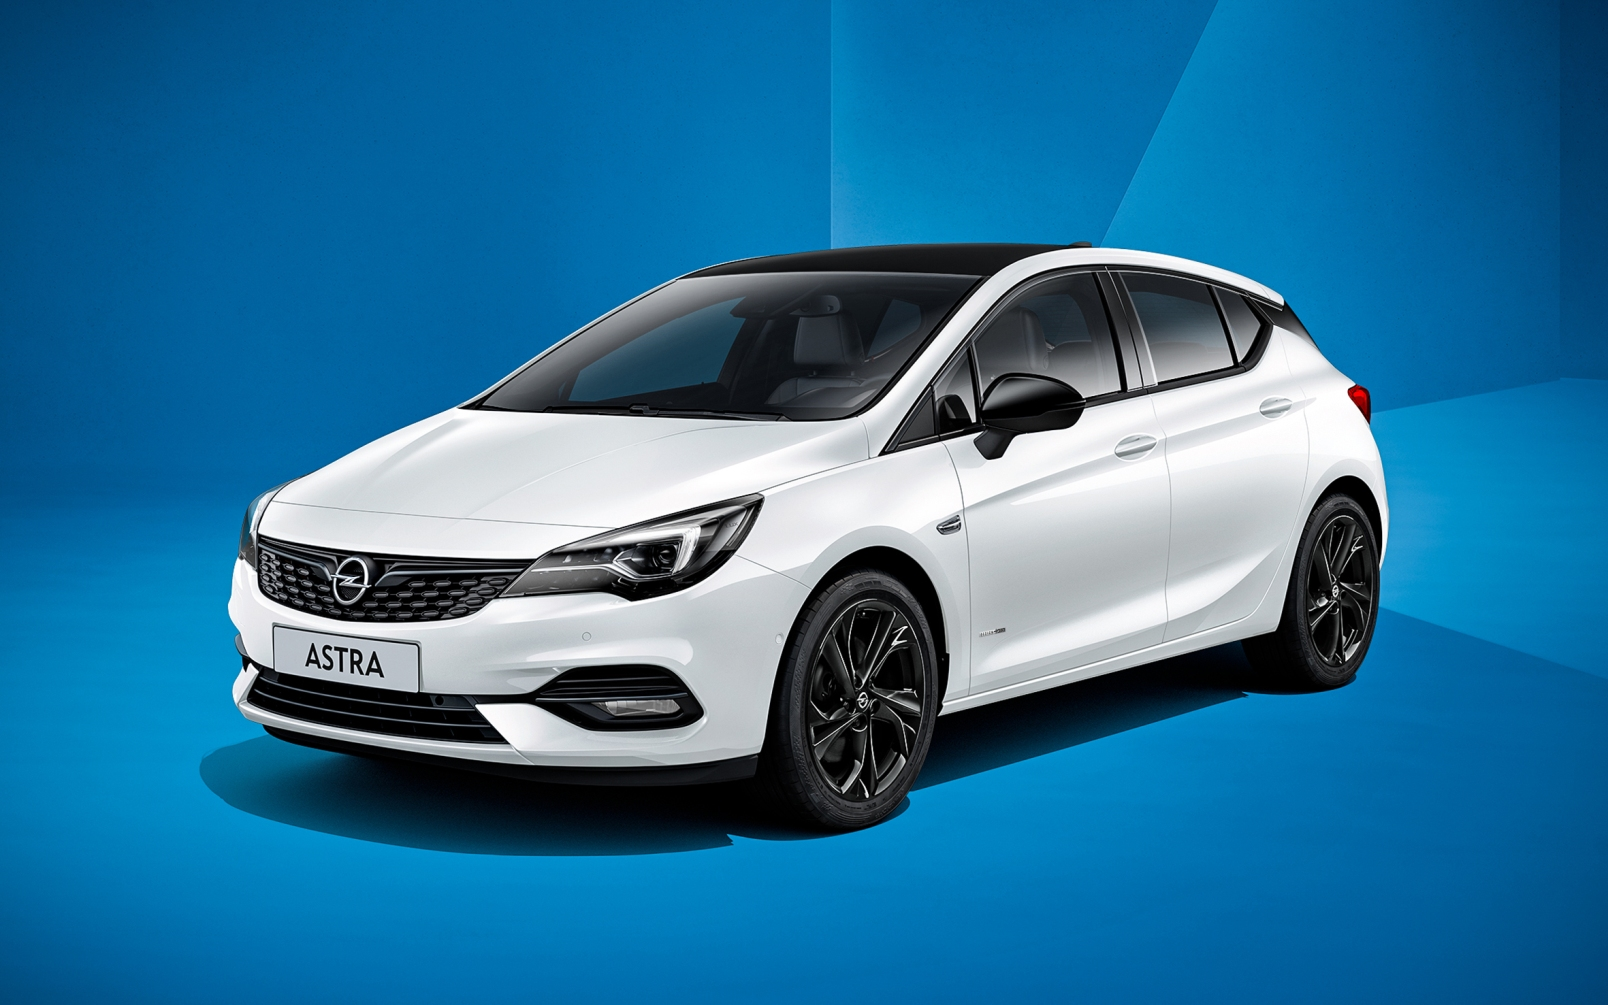 Opel Astra Design & Tech (2)